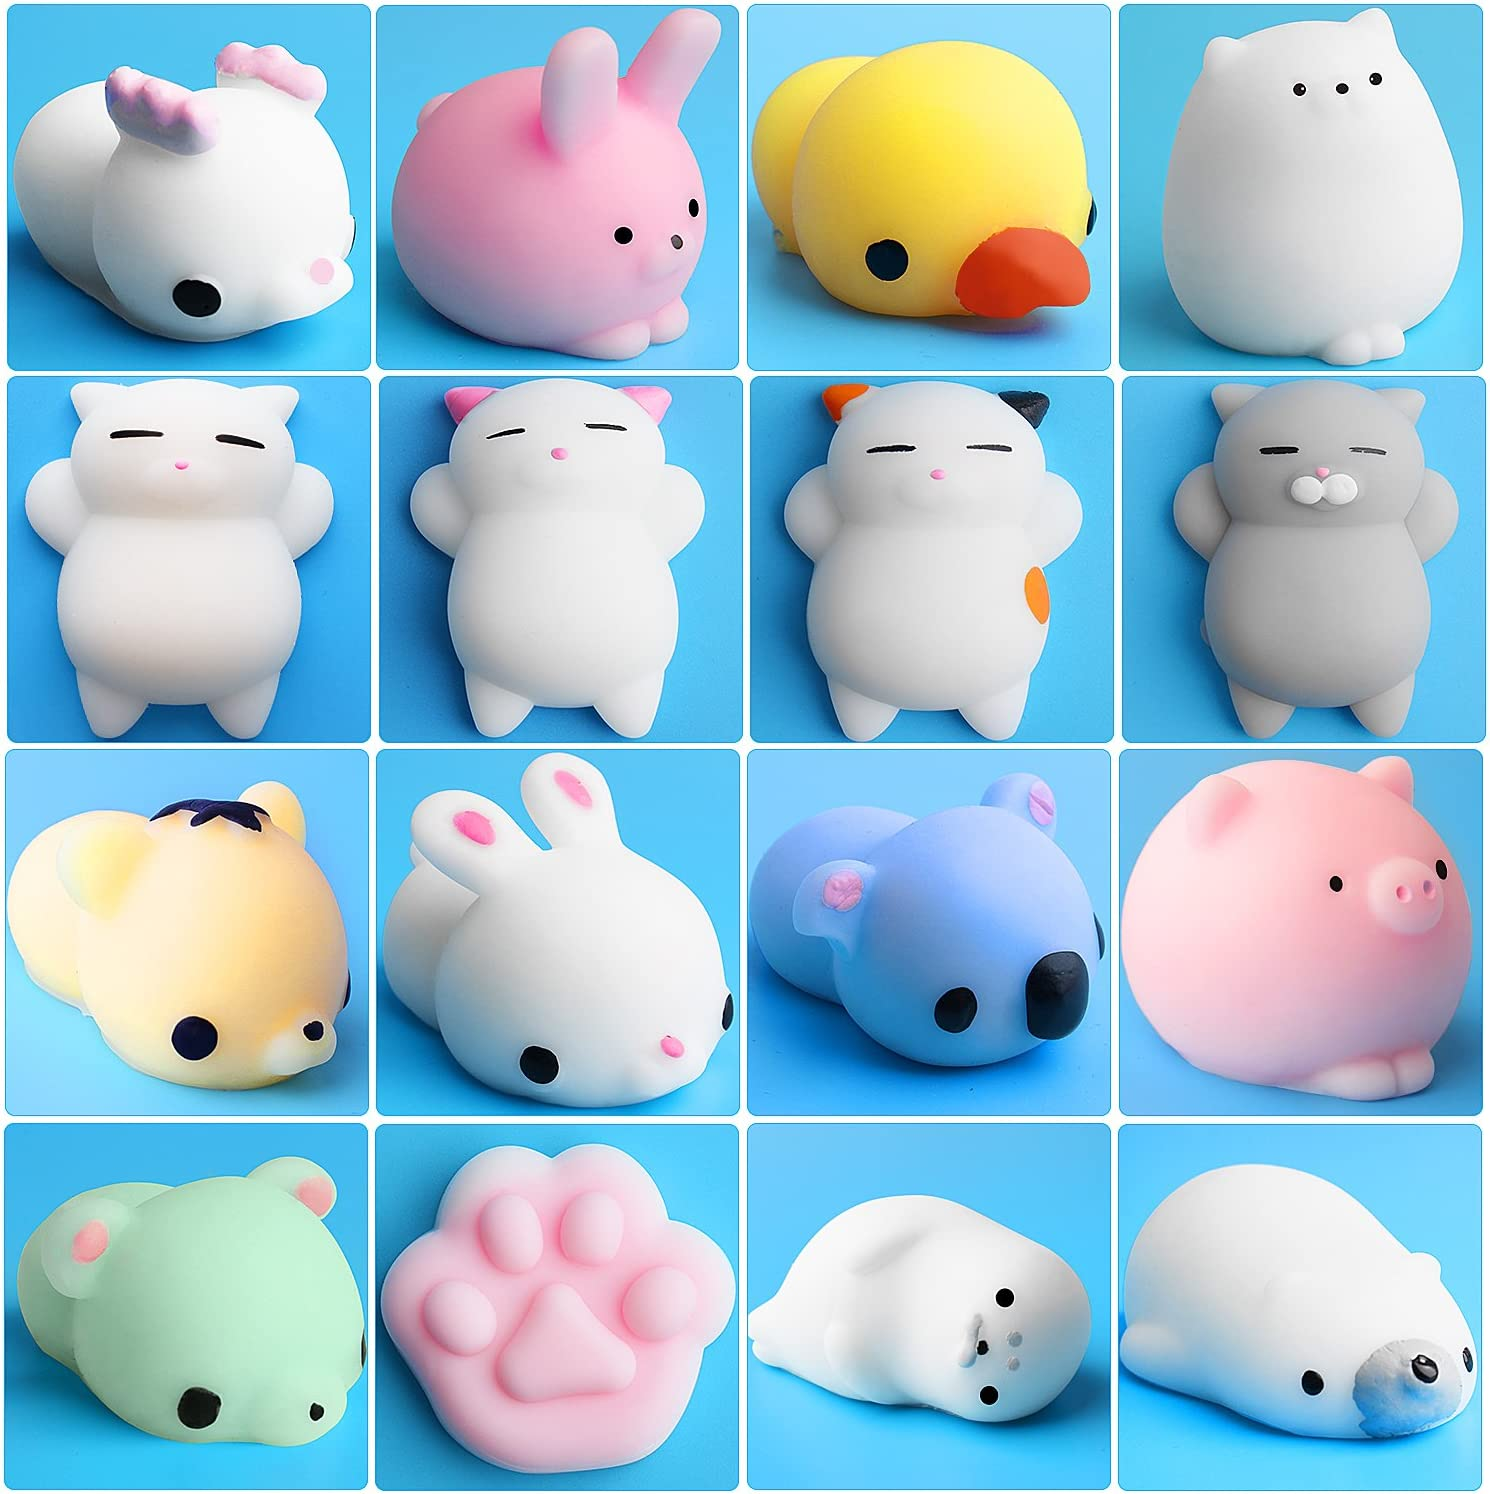 Outee Mochi Squishys Toys, 16 Pcs Mini Squishys Animals Toys Mochi Cat Squishys Stress Relief Mochi Animal with Felt Bag